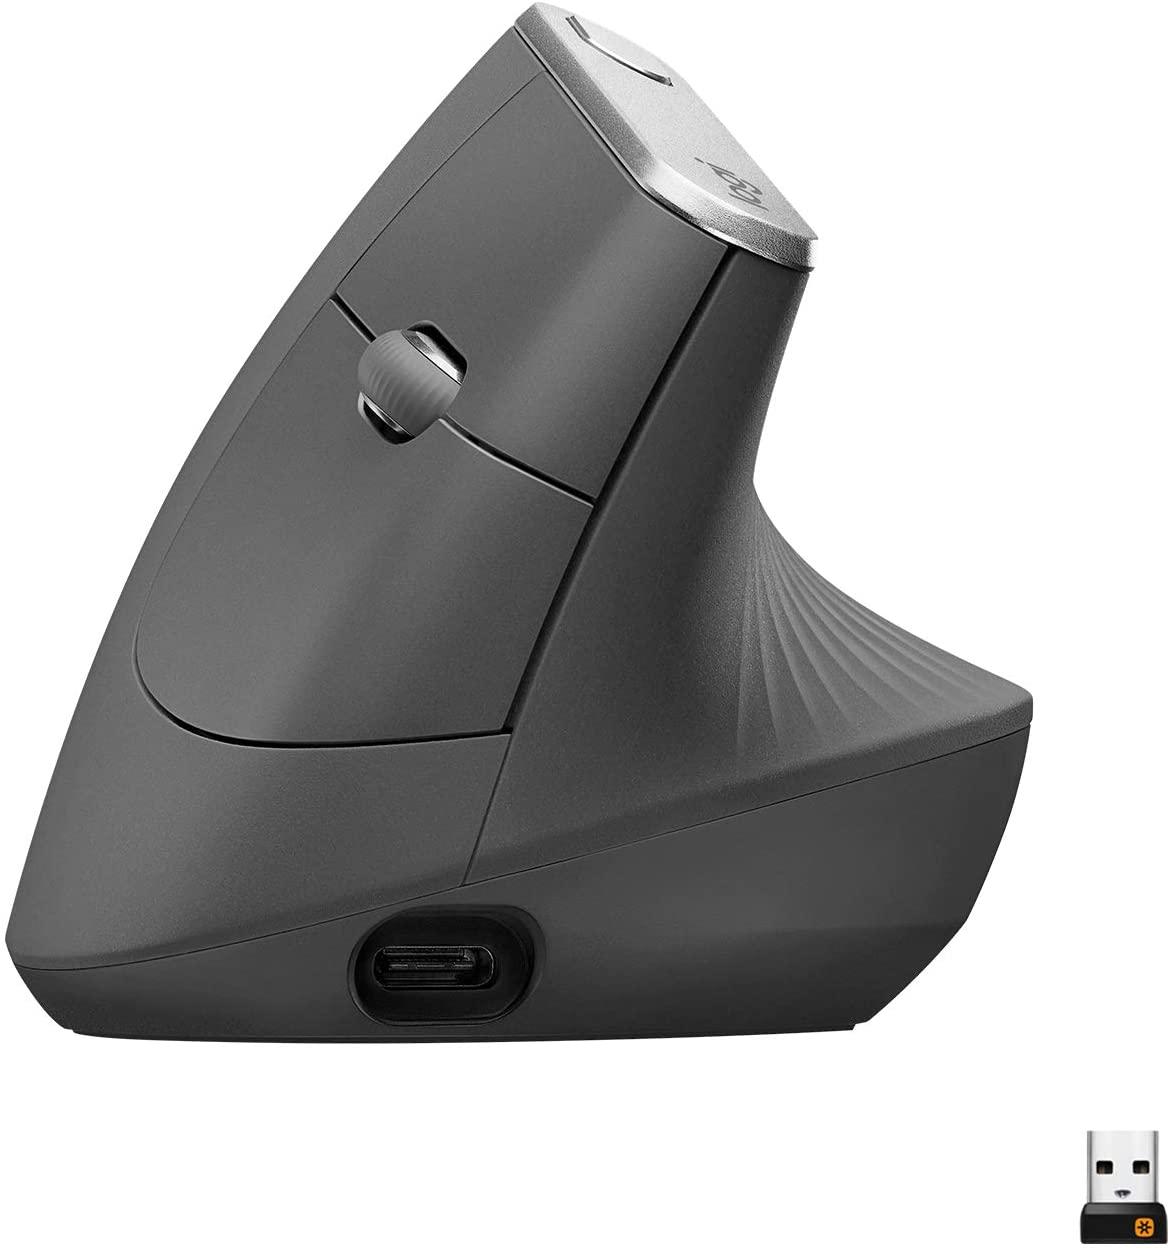 logitech mx vertical advanced ergonomic mouse (910-005448)2